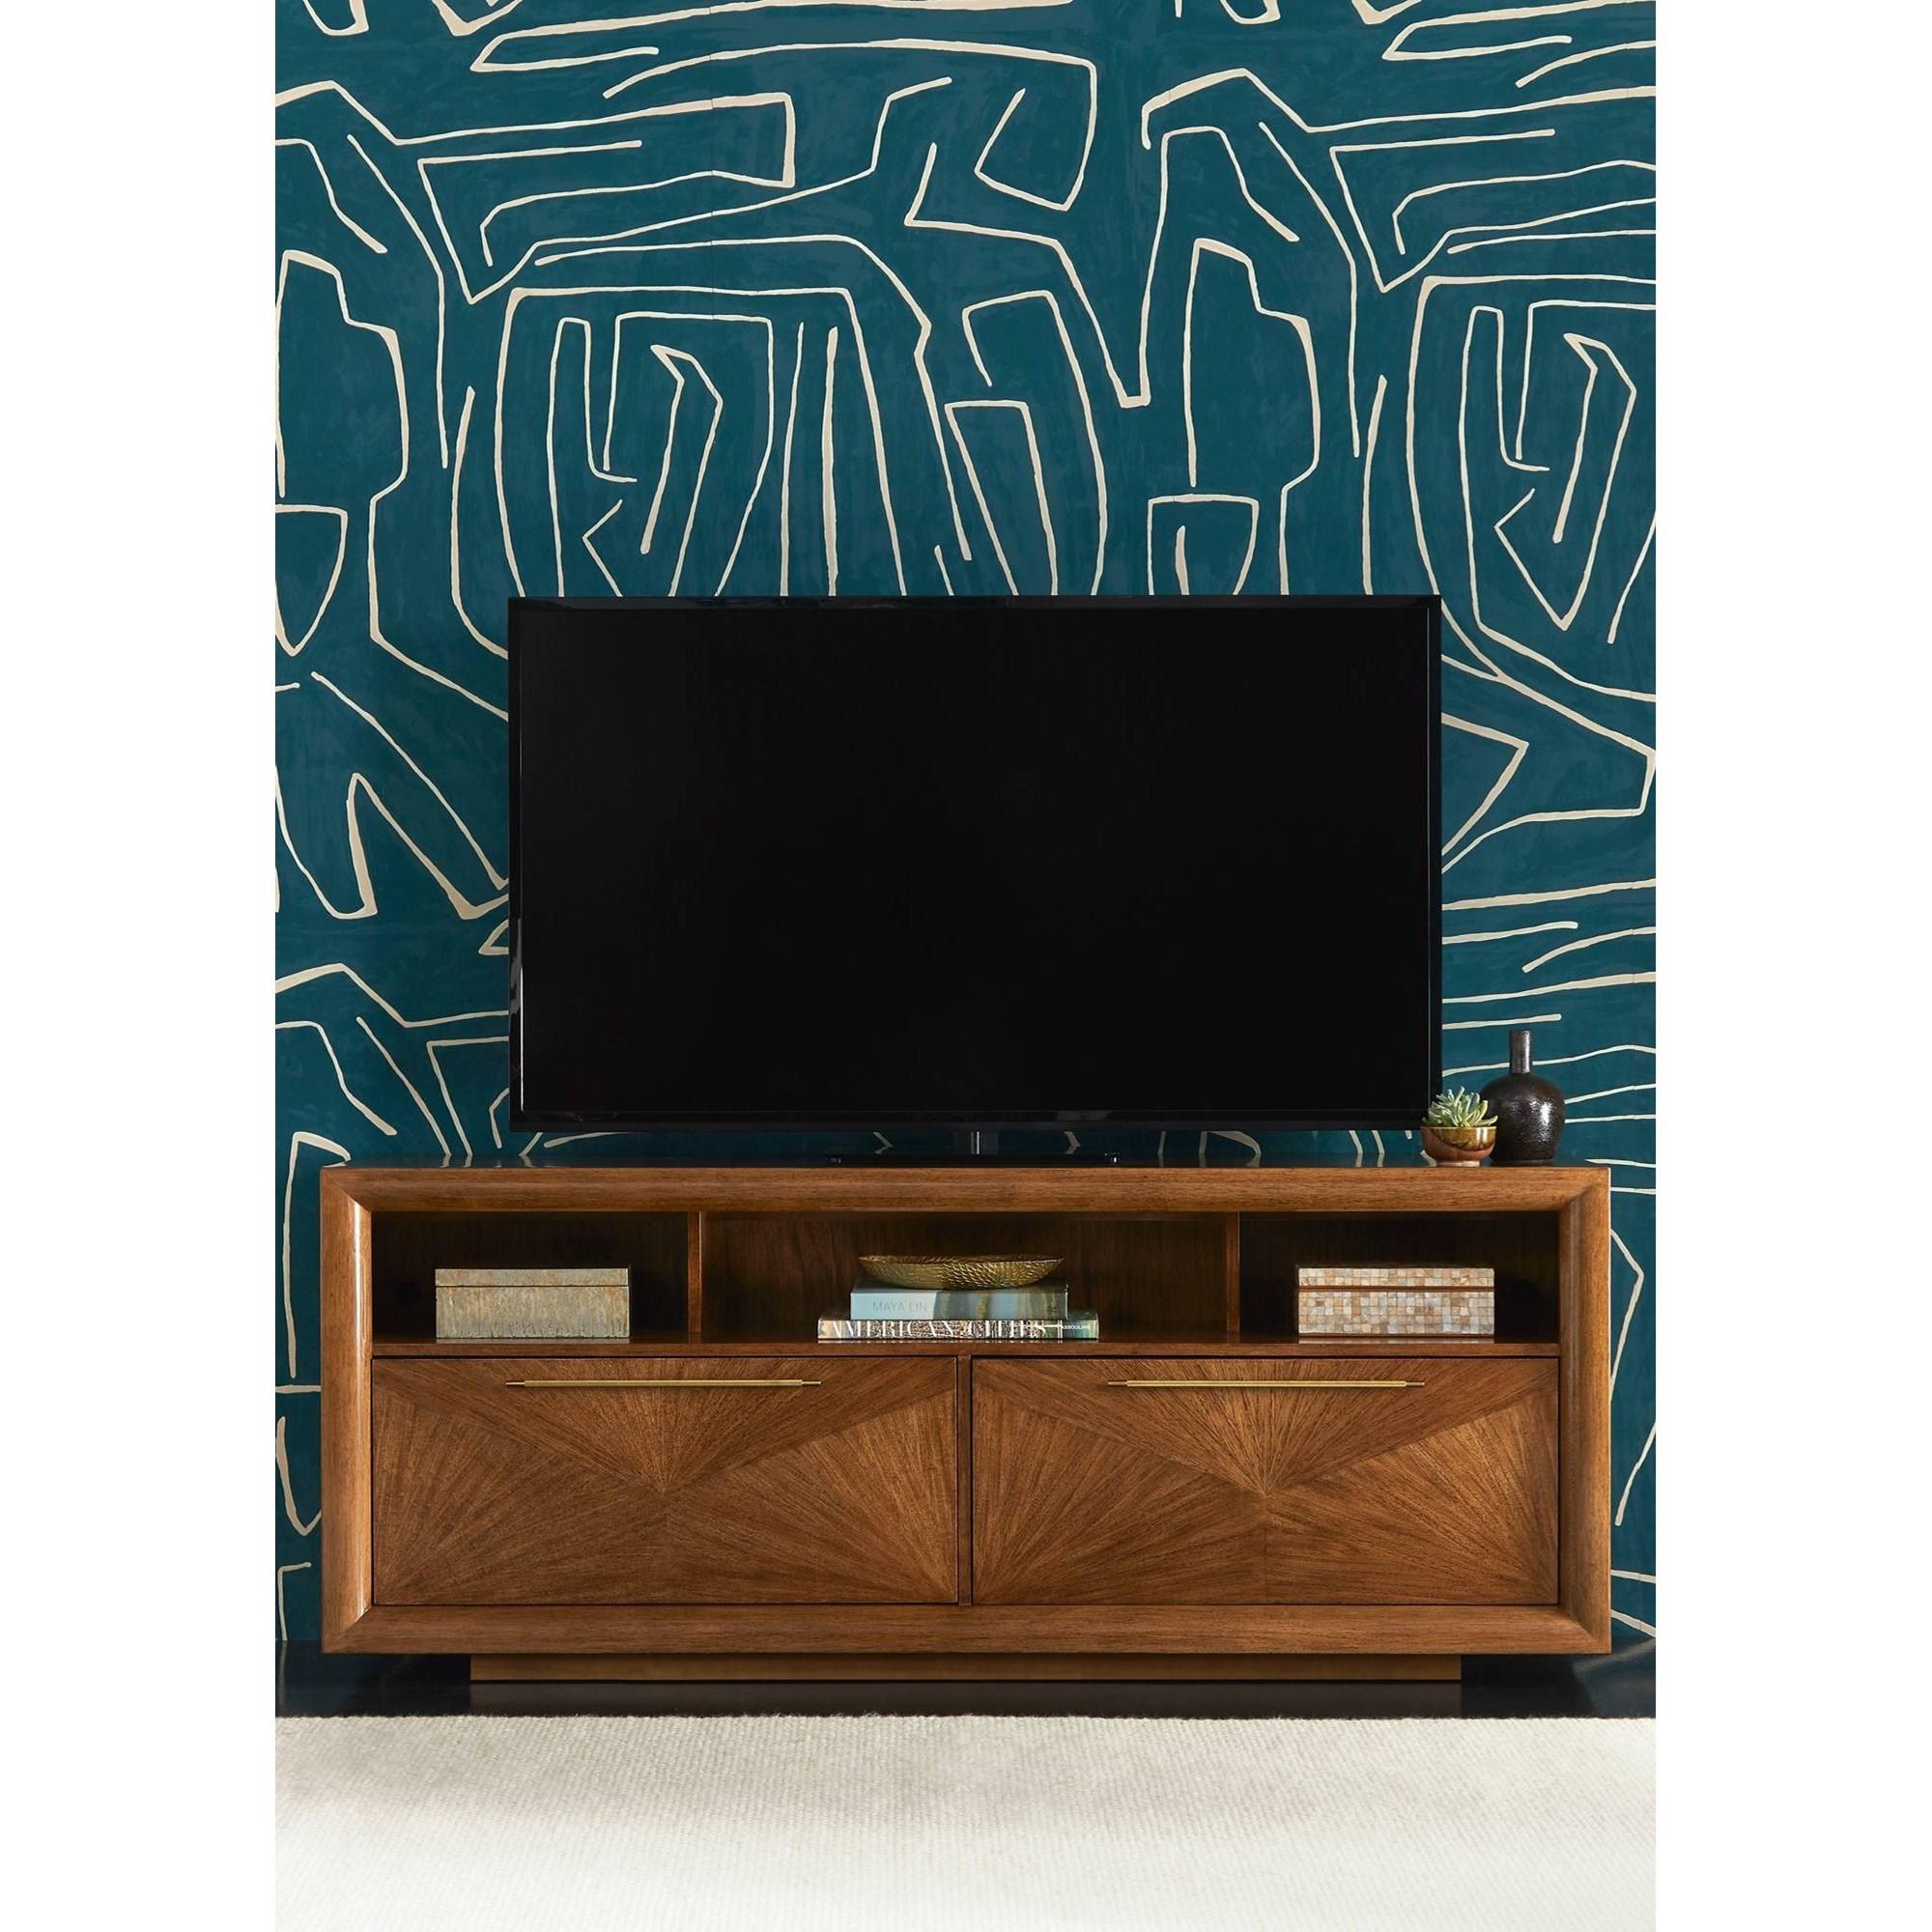 Stanley Furniture Panavista 704 15 31 Panorama Media